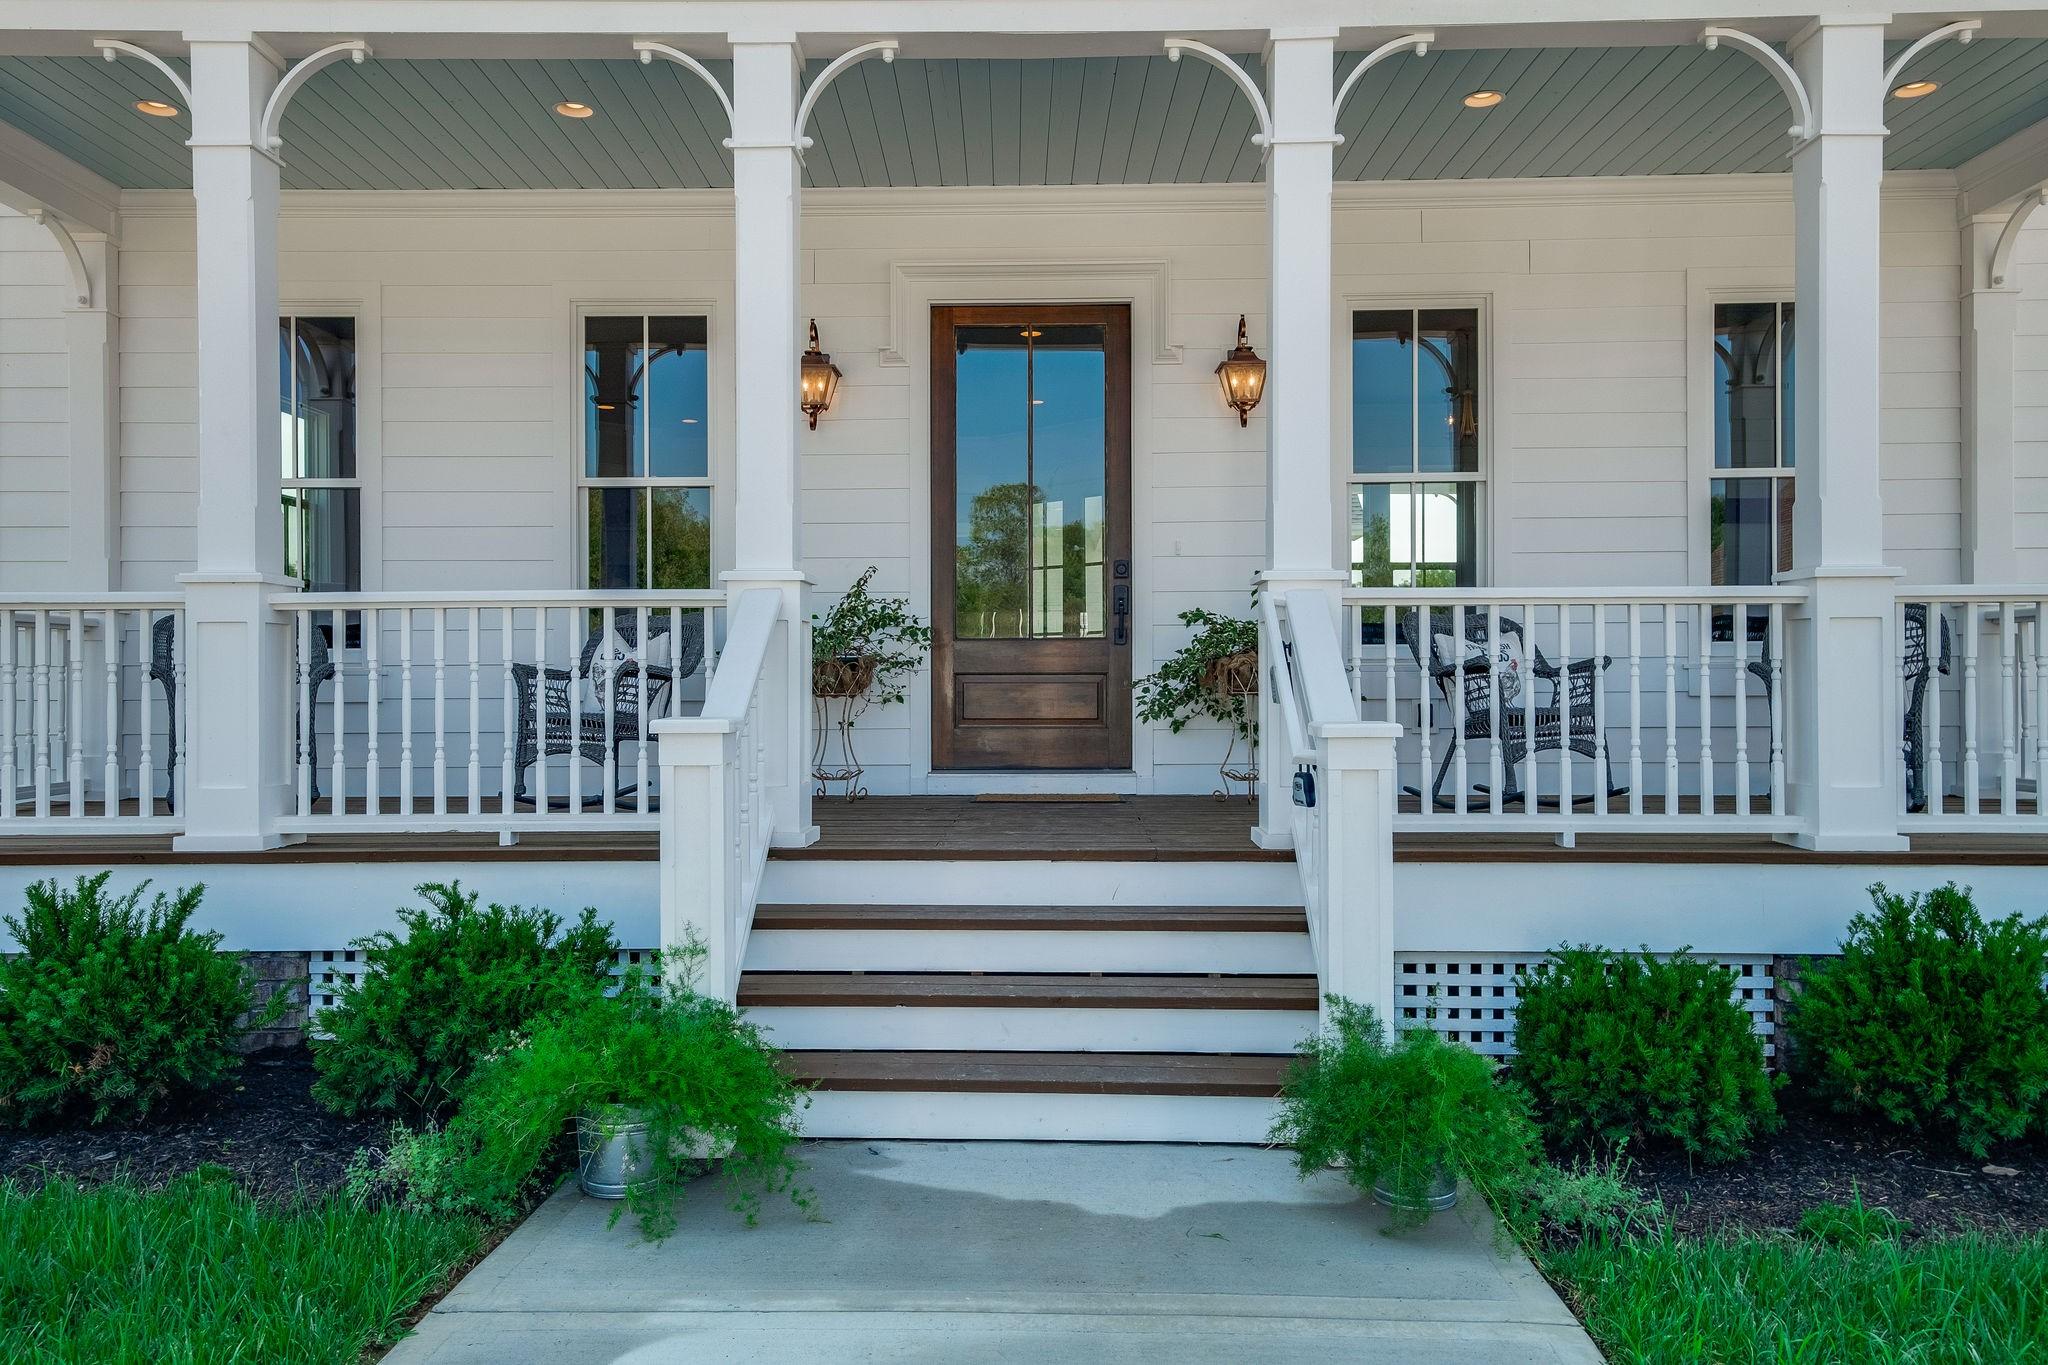 383 Stephens Valley Blvd. Property Photo - Nashville, TN real estate listing